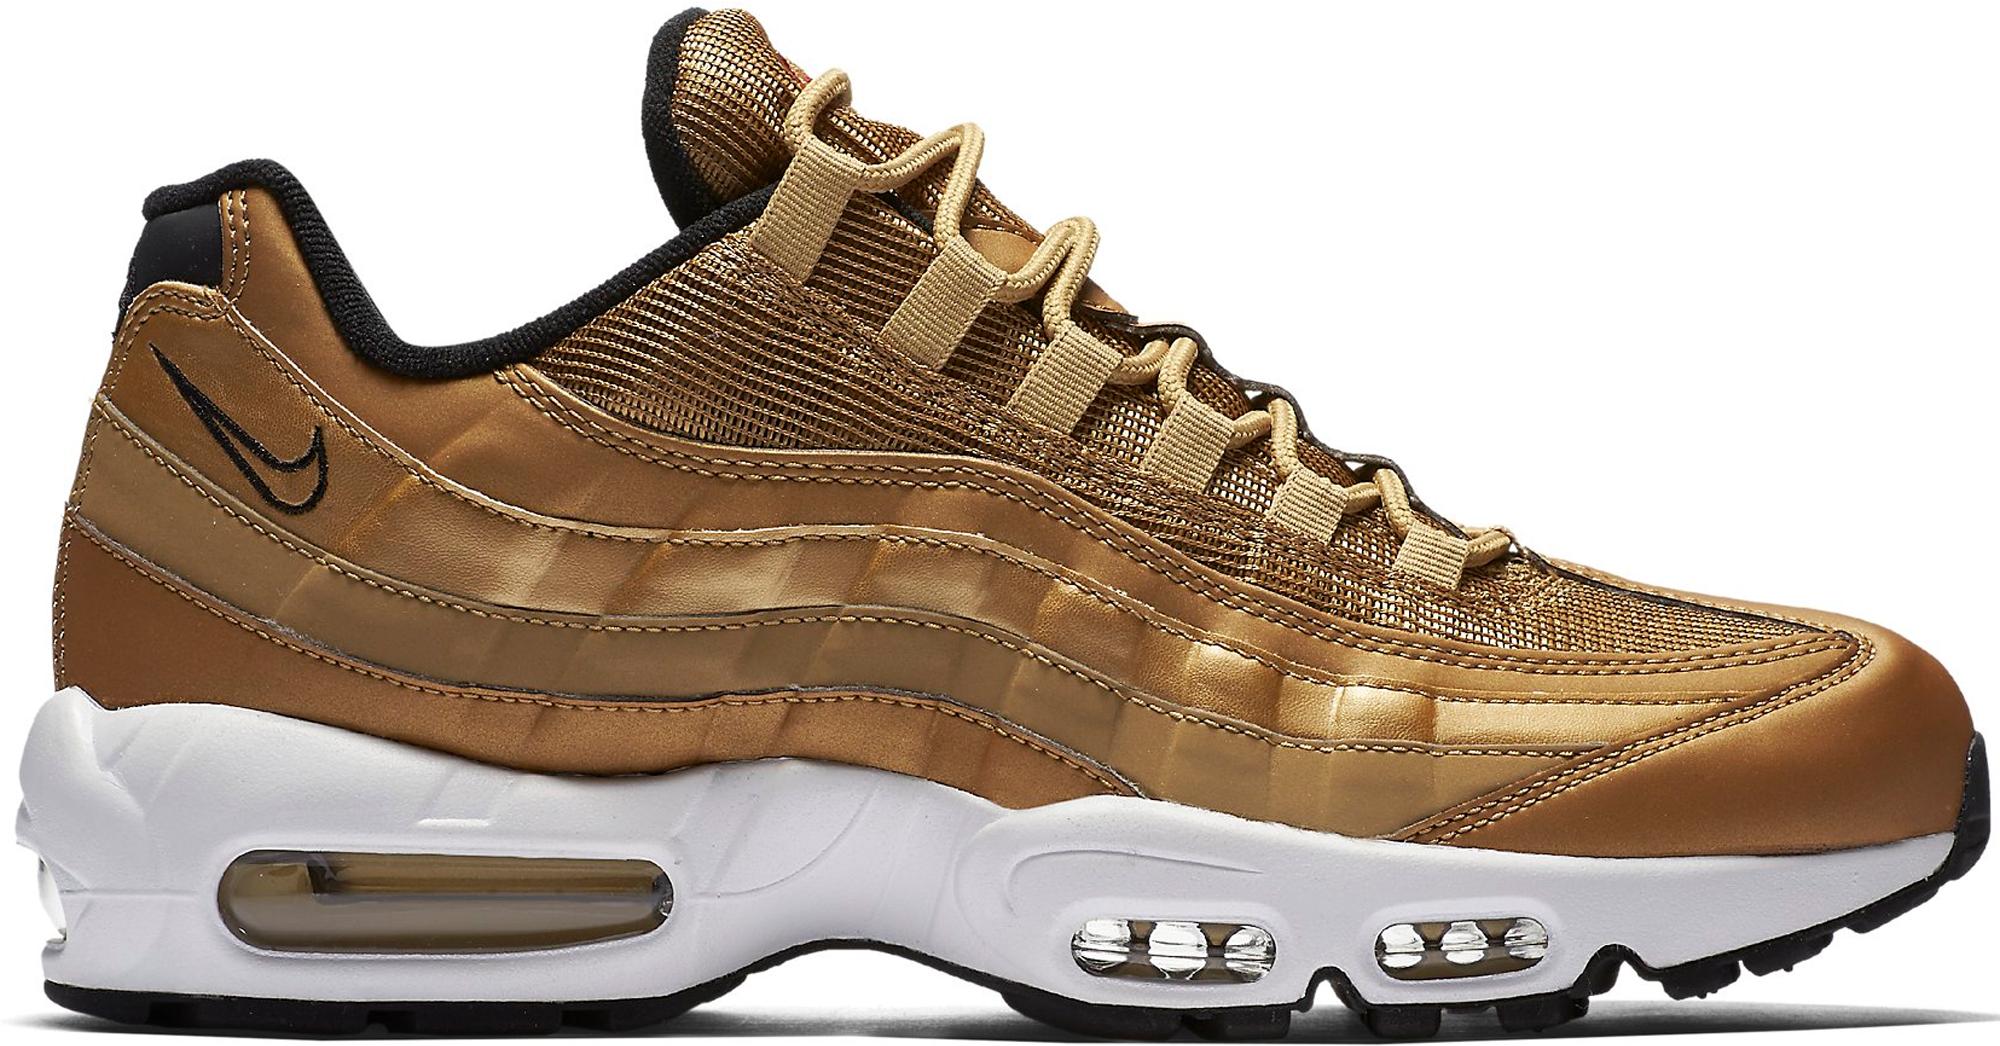 Air Max 95 Metallic Gold